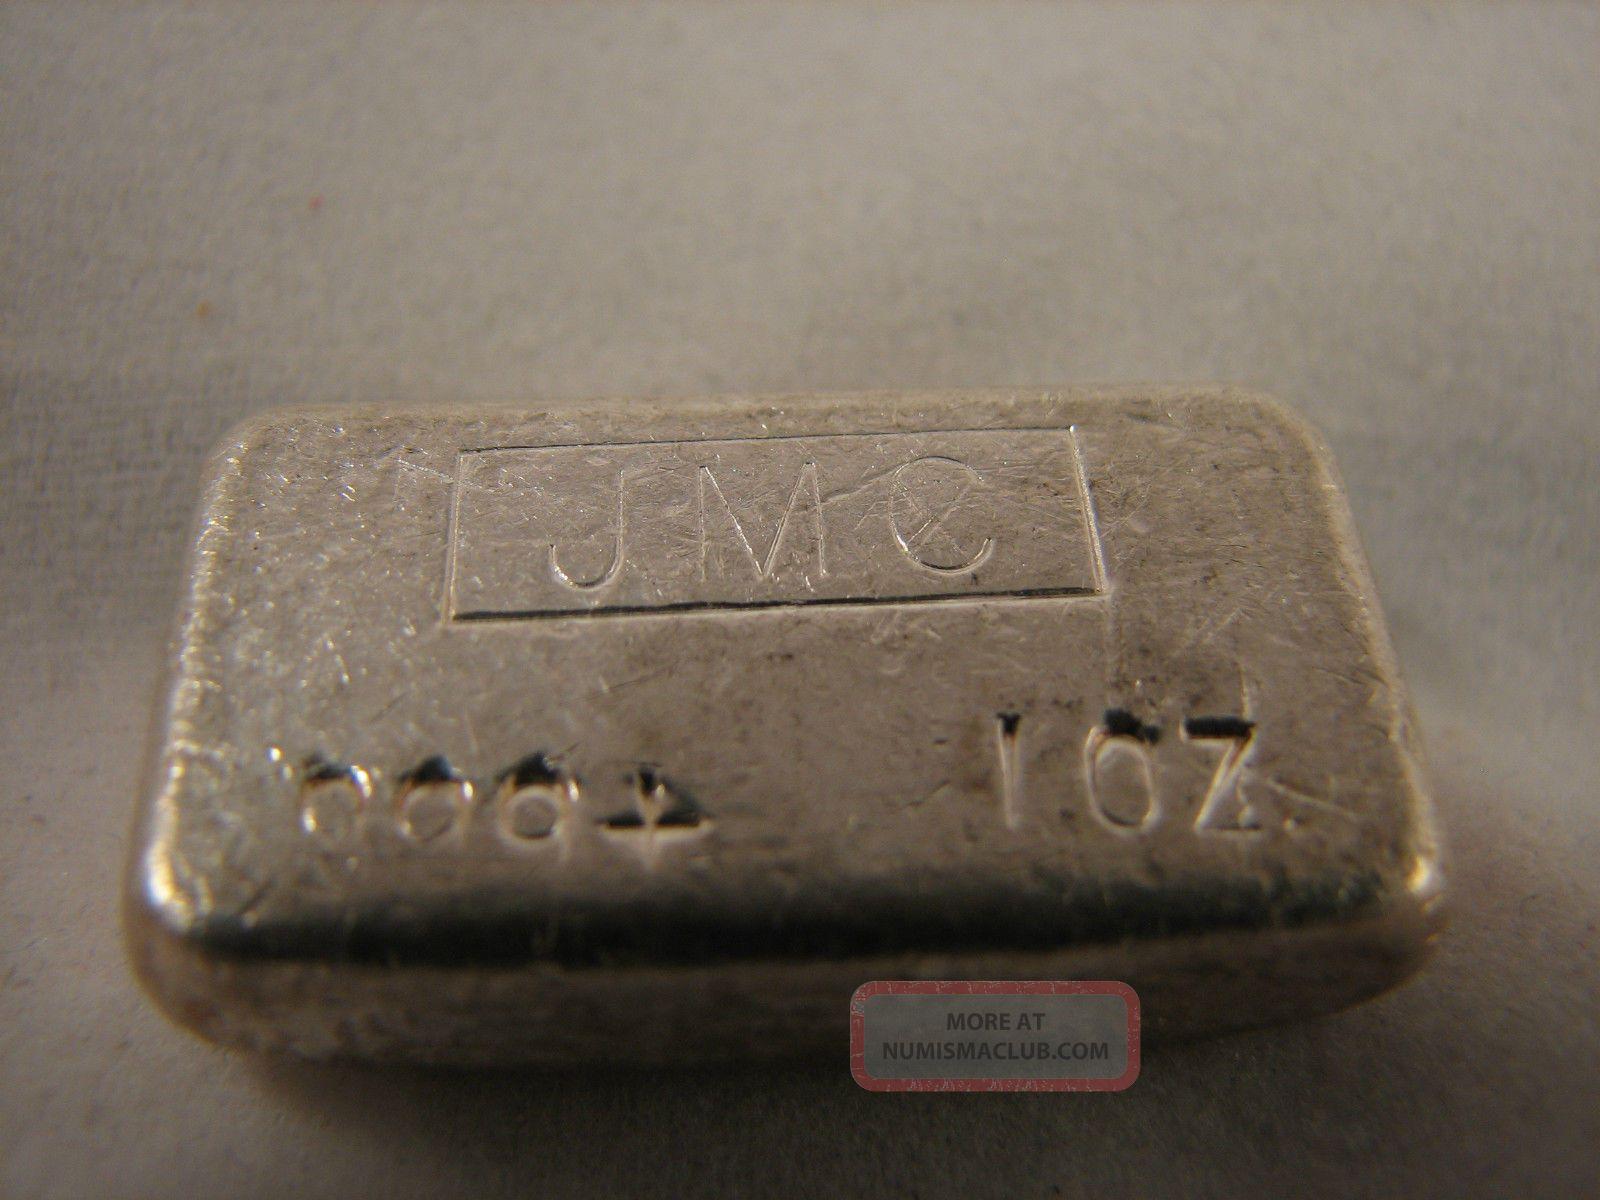 Sandon Bc Canada 1oz Hand Poured 999 Silver Bar Jmc